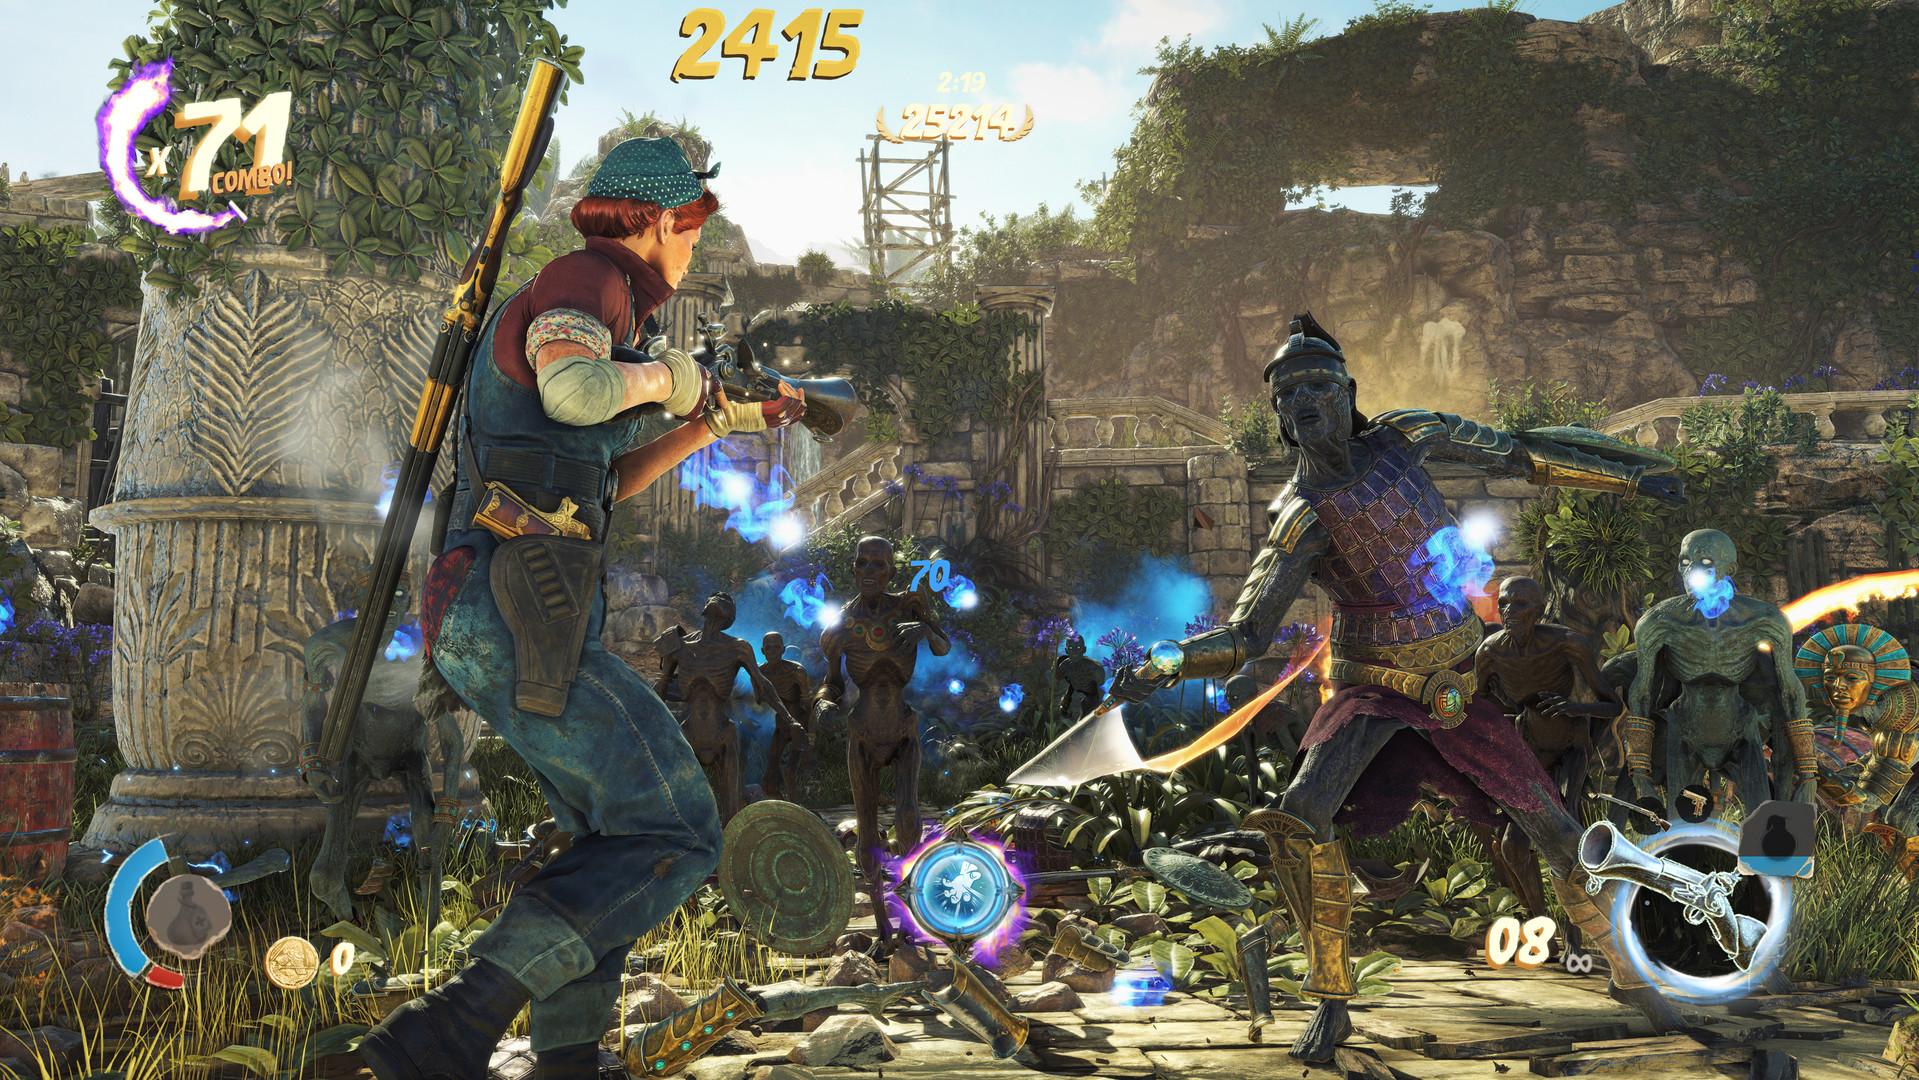 Gaming: Strange Brigade (DX12, Vulkan) - The AMD